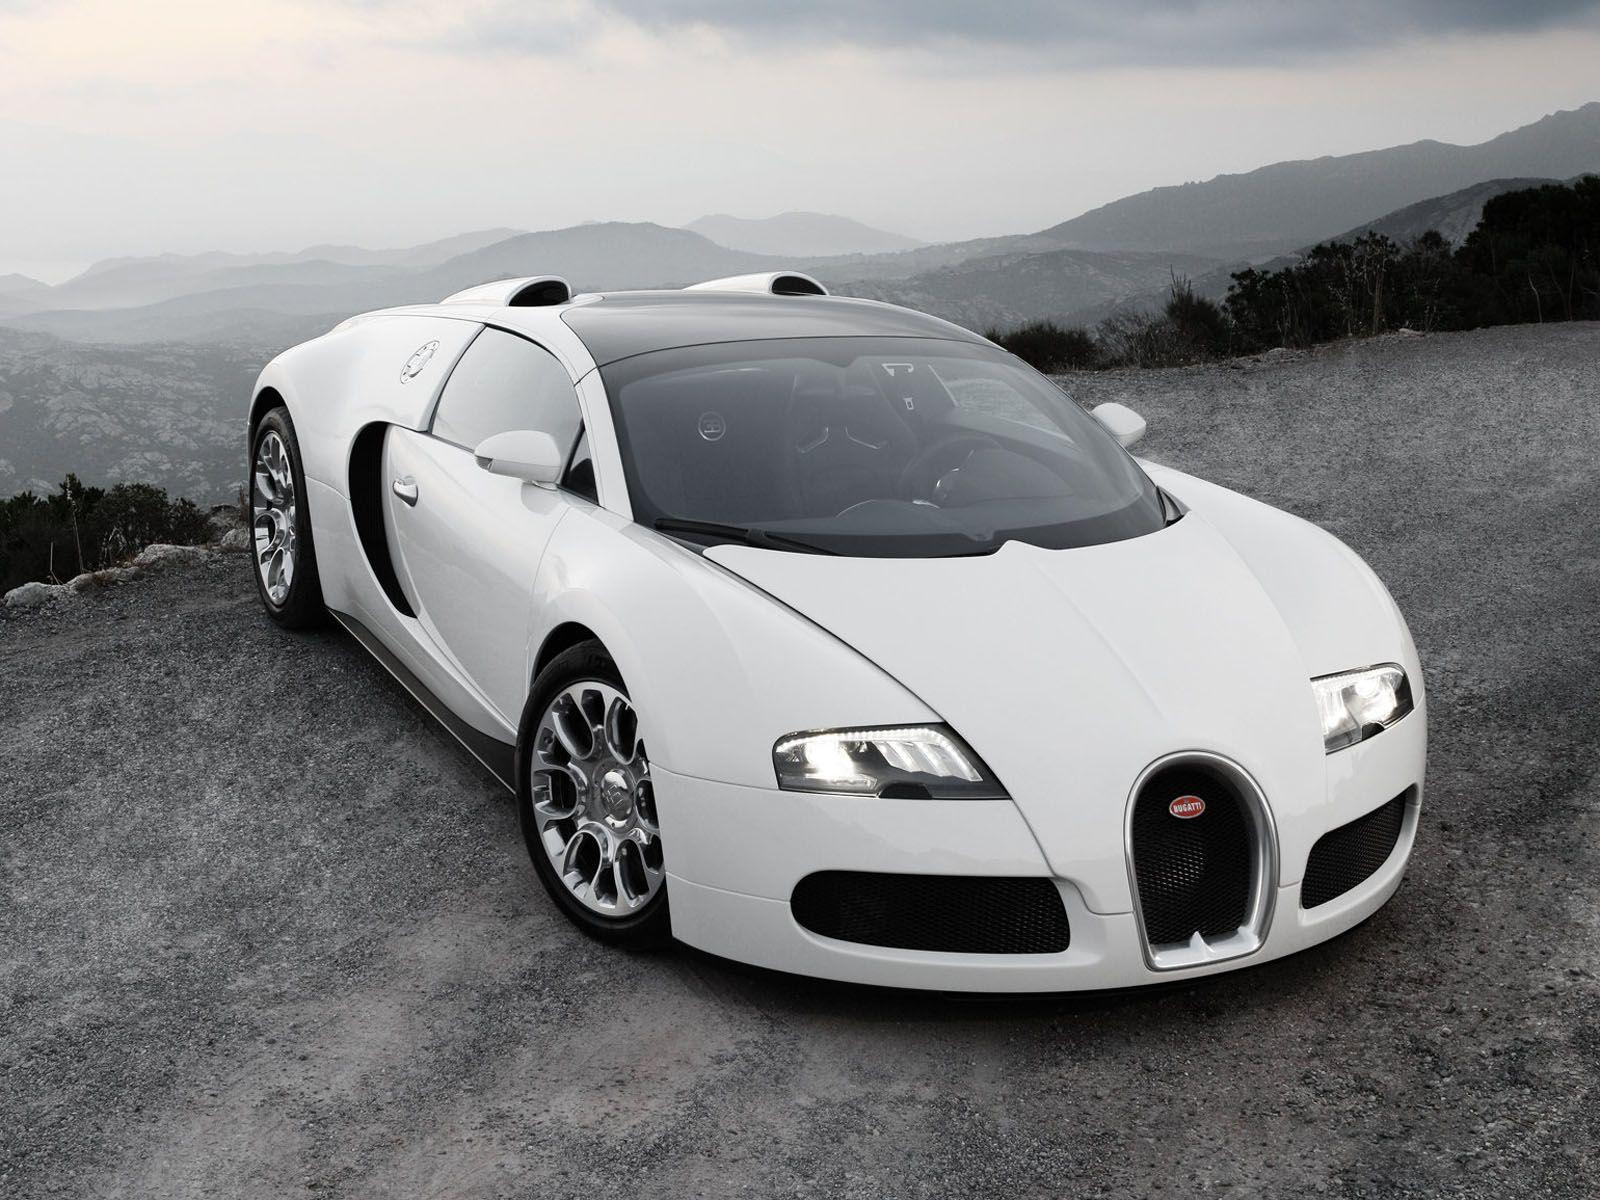 Bugatti Veyron Bugatti Veyron Bugatti Cars Bugatti Veyron 16